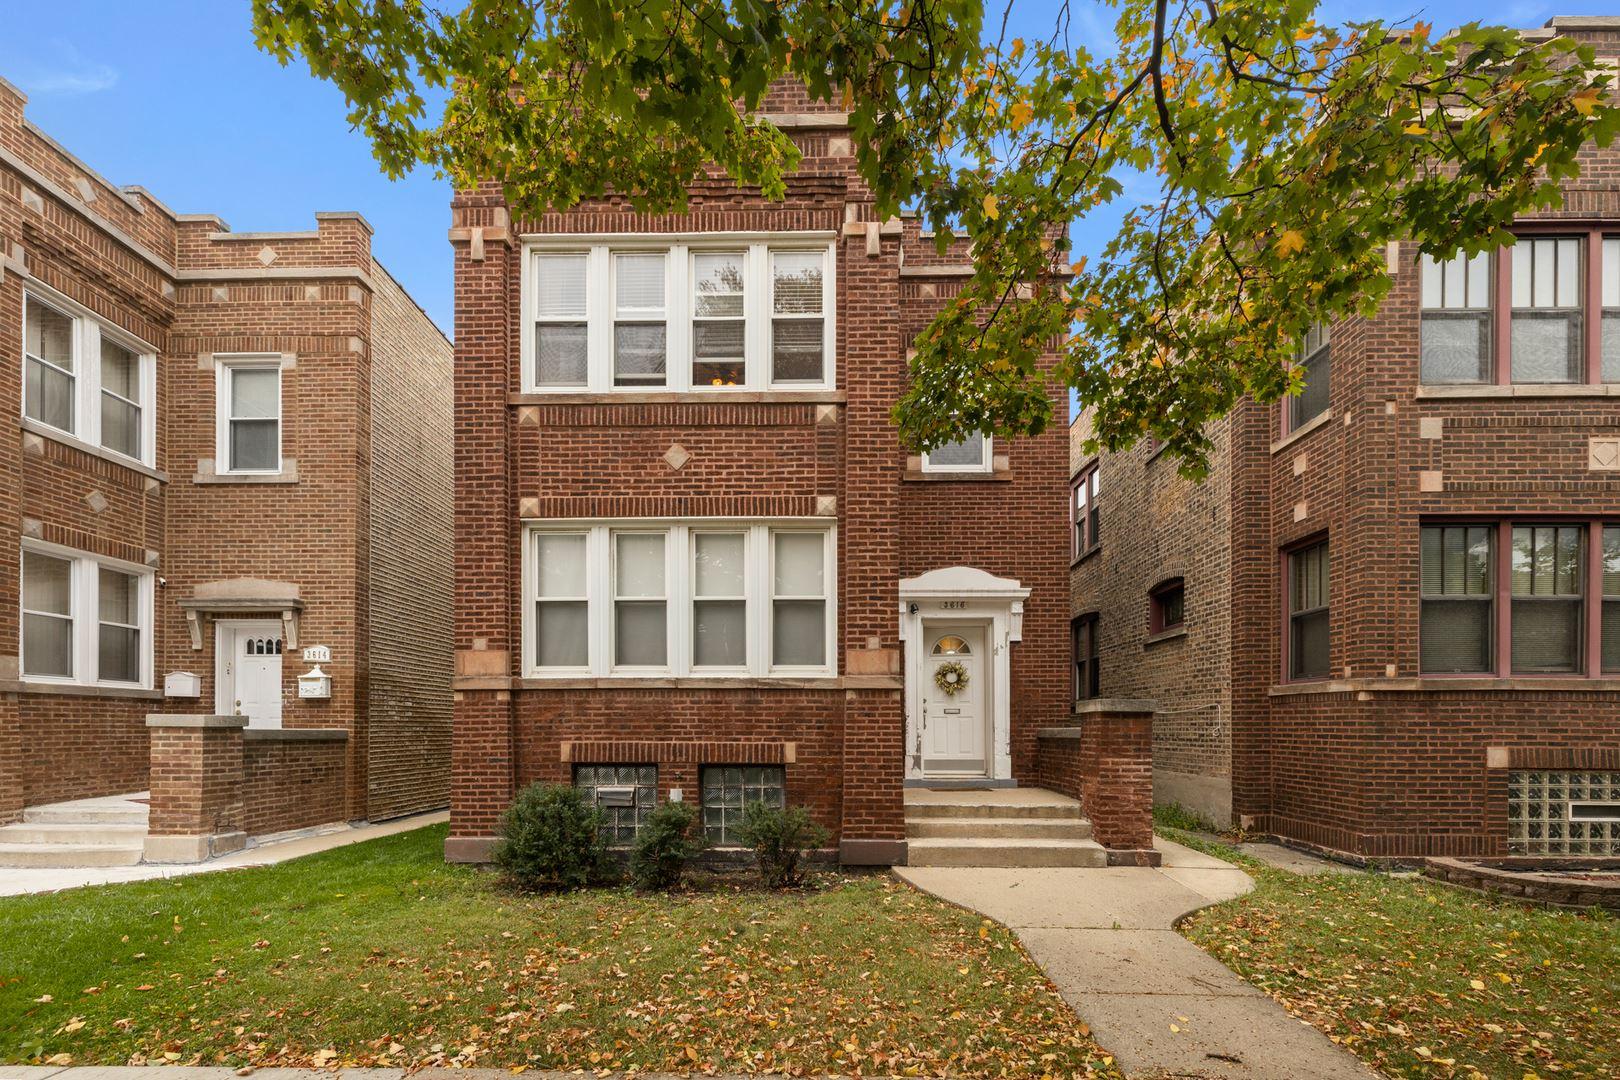 3616 N Whipple Street, Chicago, IL 60618 - #: 11245570